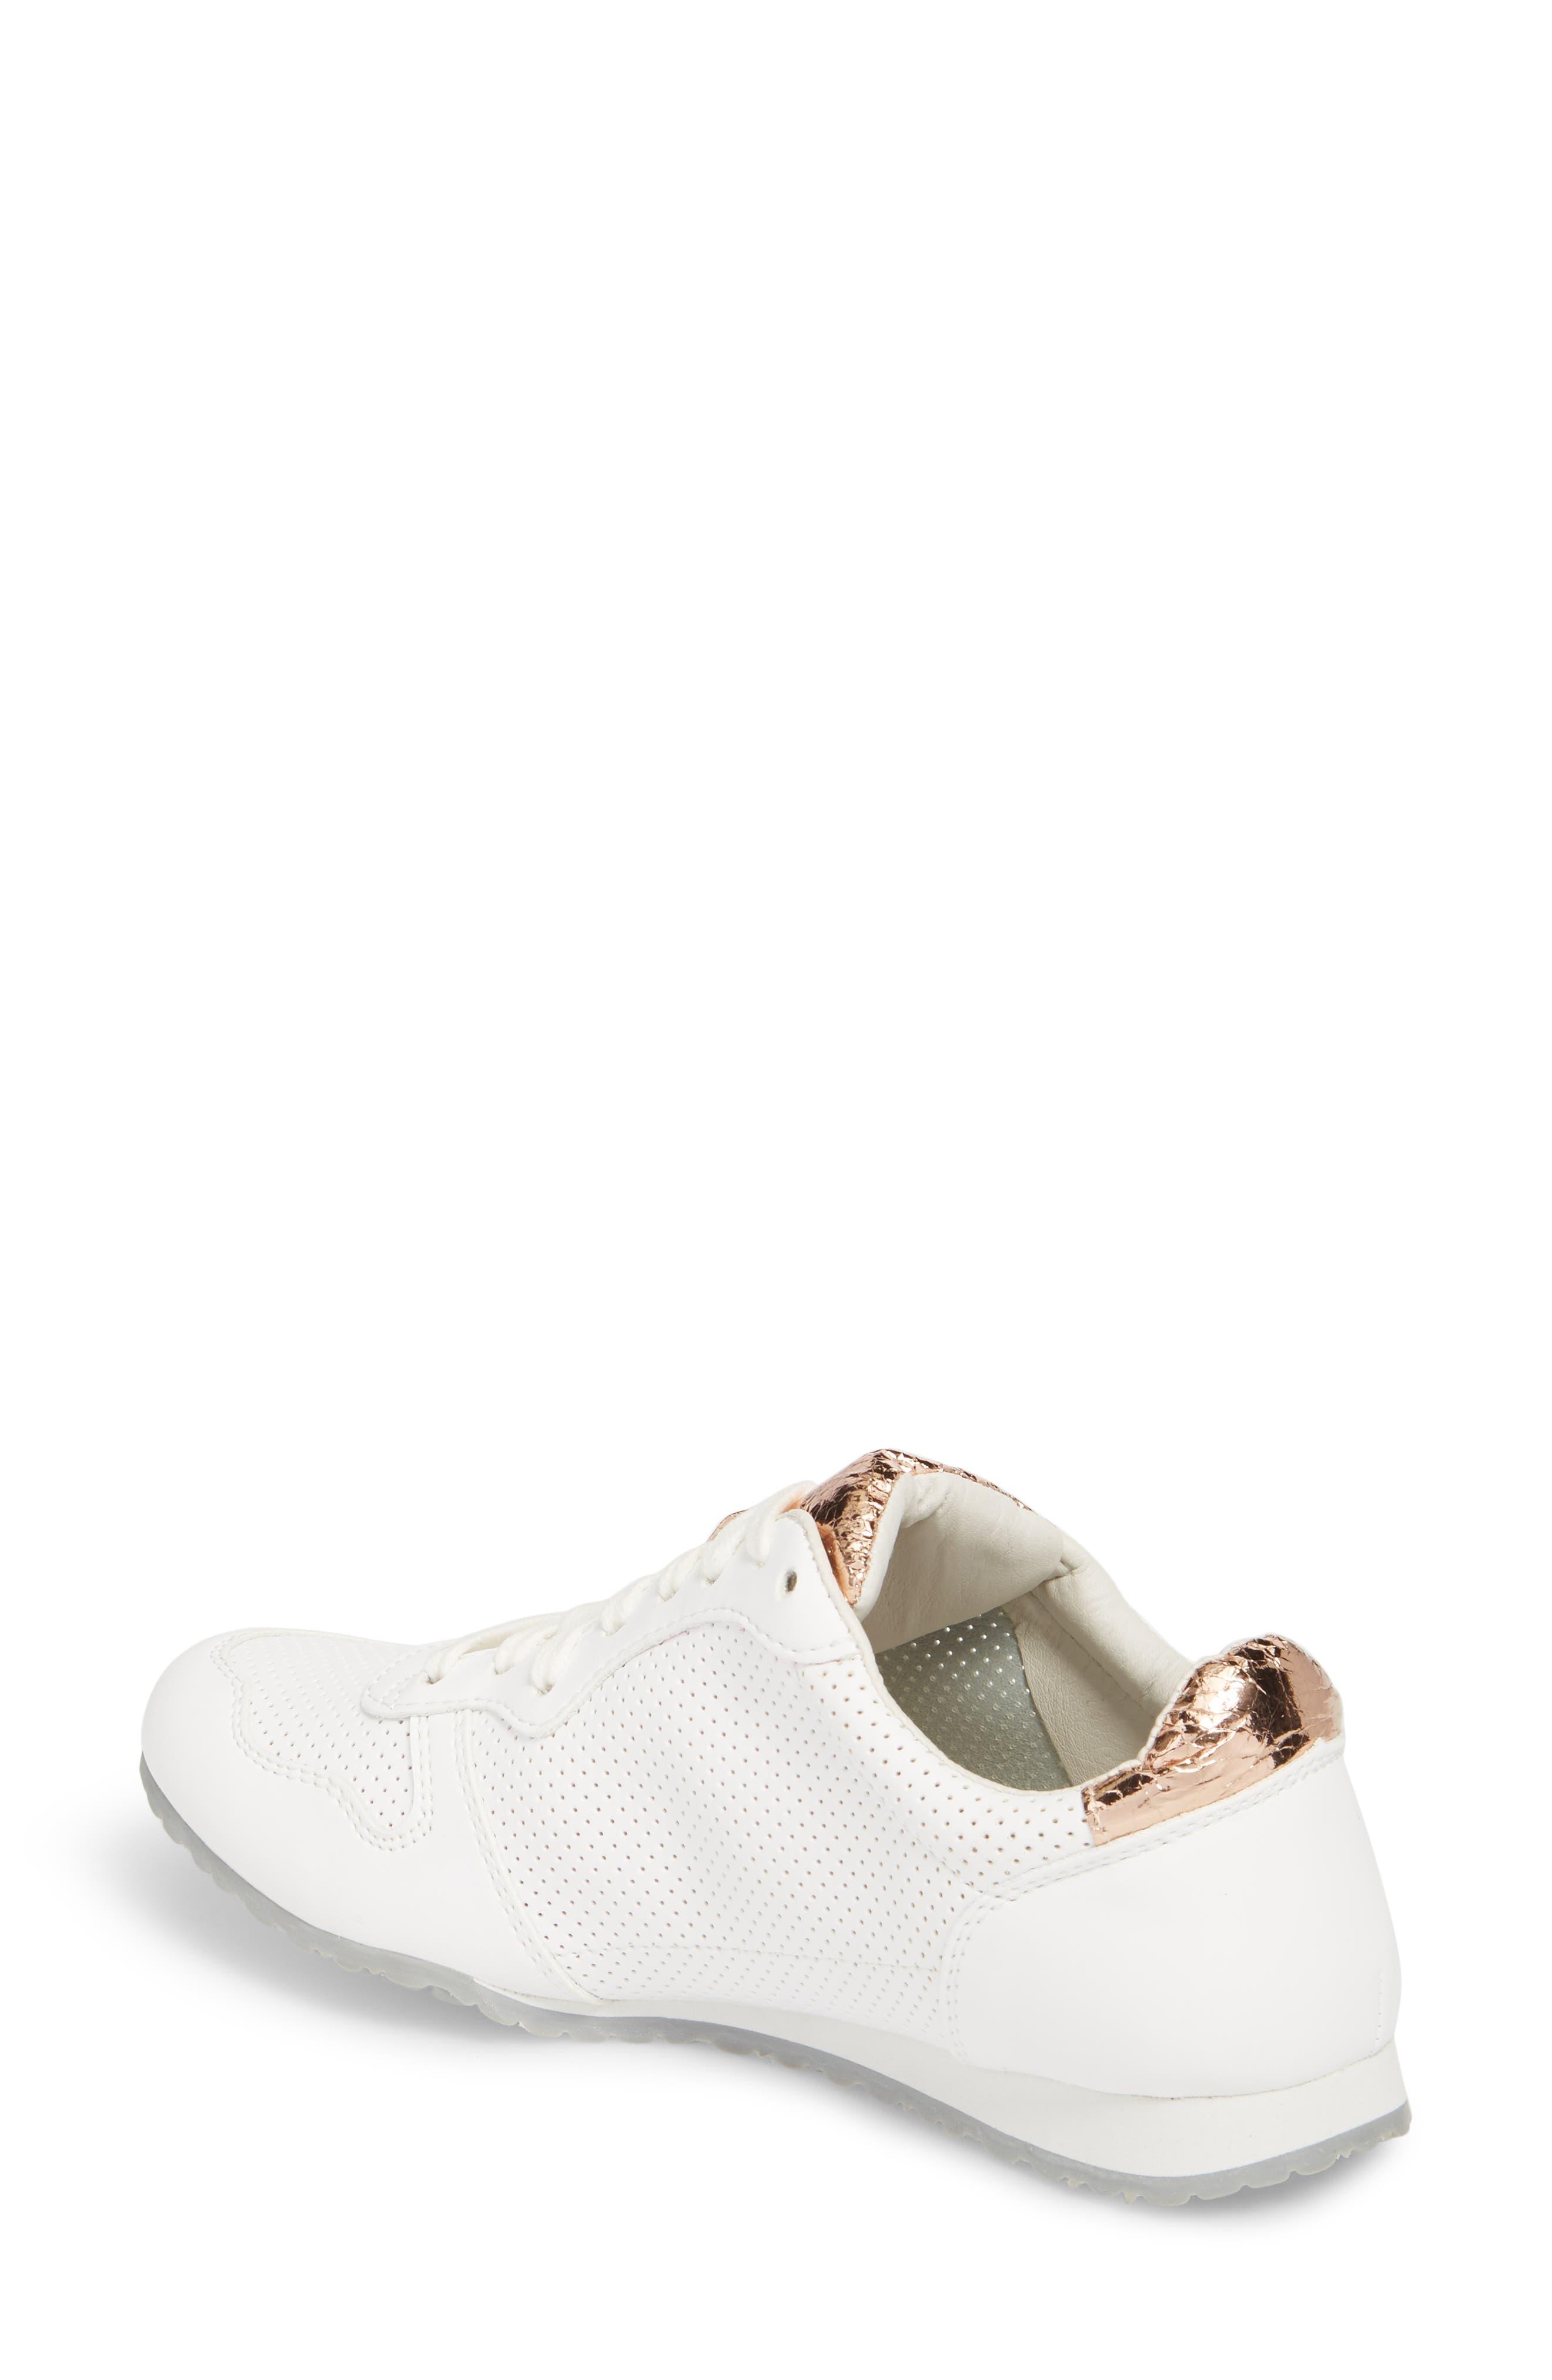 Joanna Perforated Sneaker,                             Alternate thumbnail 2, color,                             124